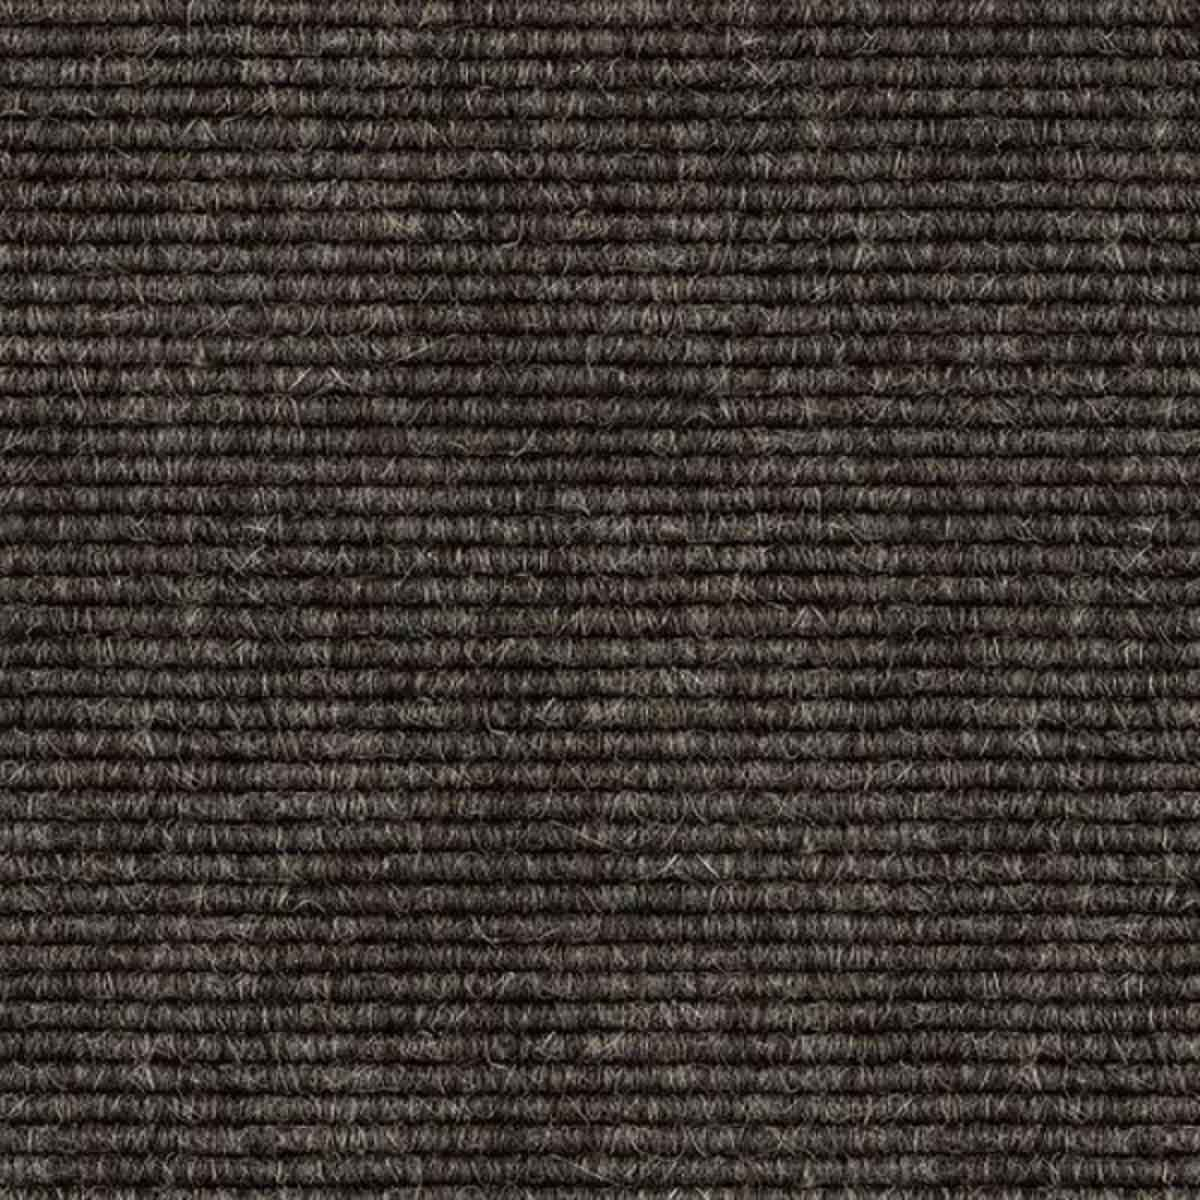 Sockelleiste Farbe 514 Jeans Gr/ö/ße 10 Meter Tretford Interland